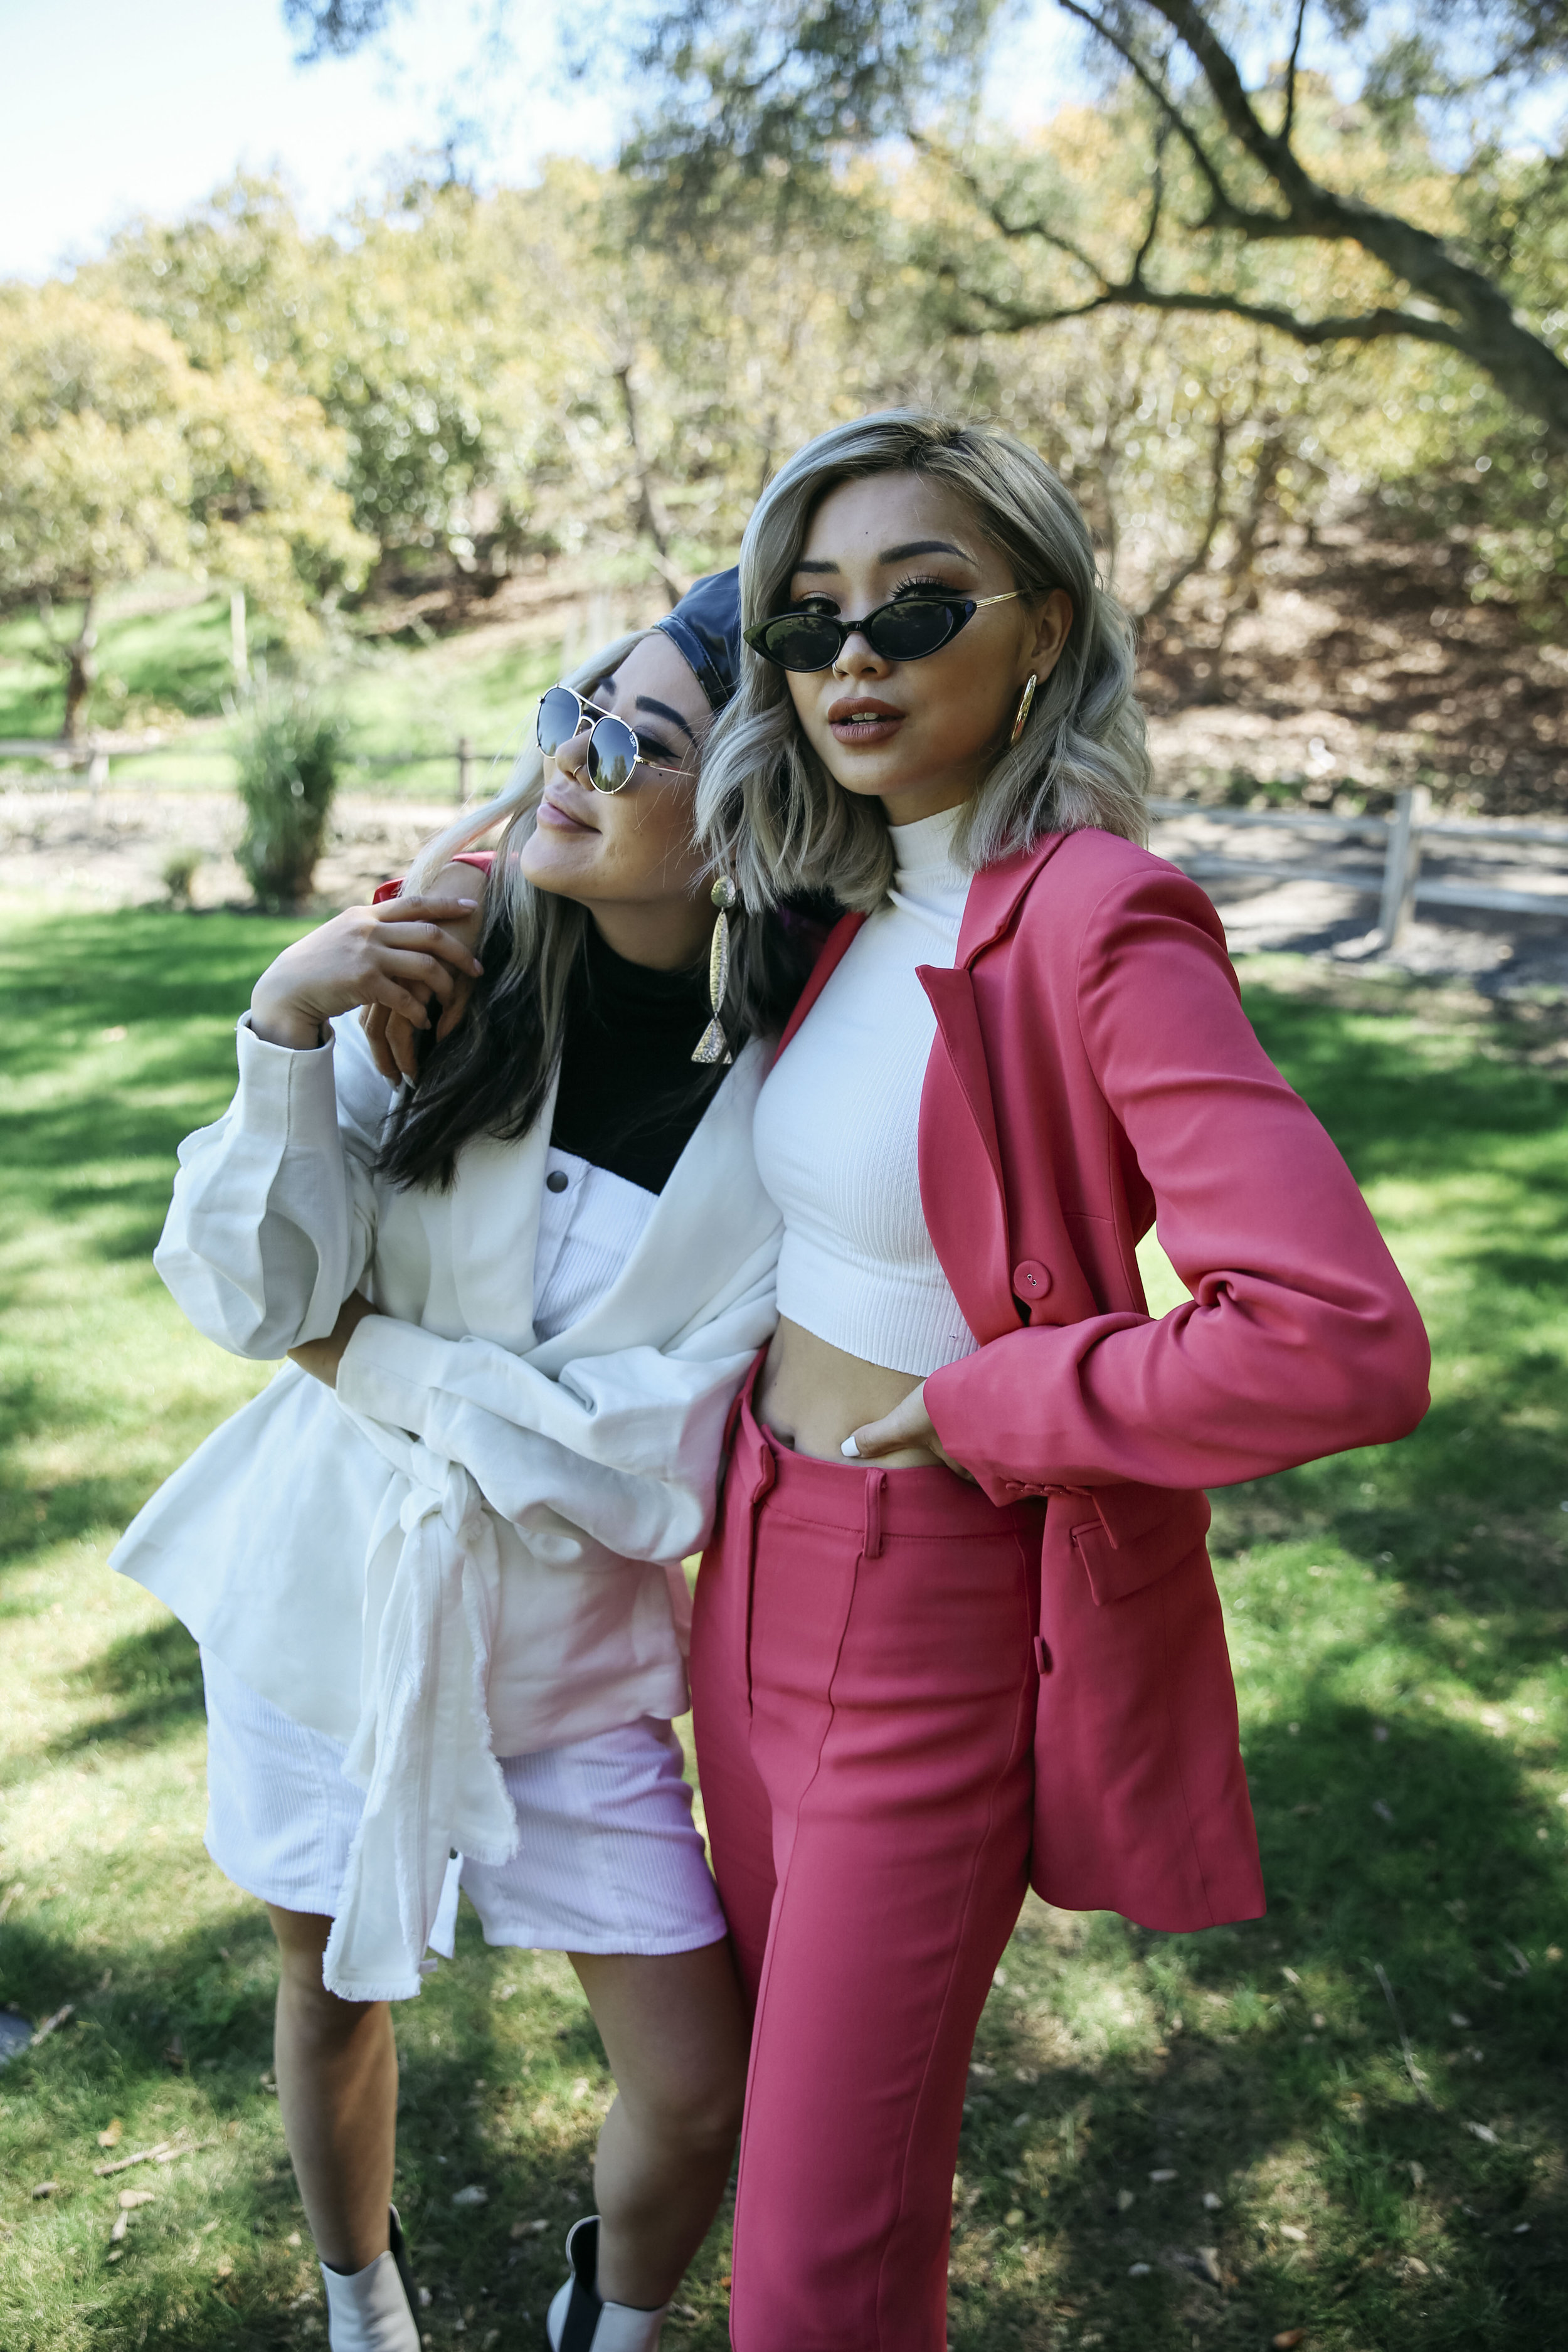 Eugenie wears  Director Jacket  +  Central Dress , Francis wears  Own Light Blazer  + Pant.